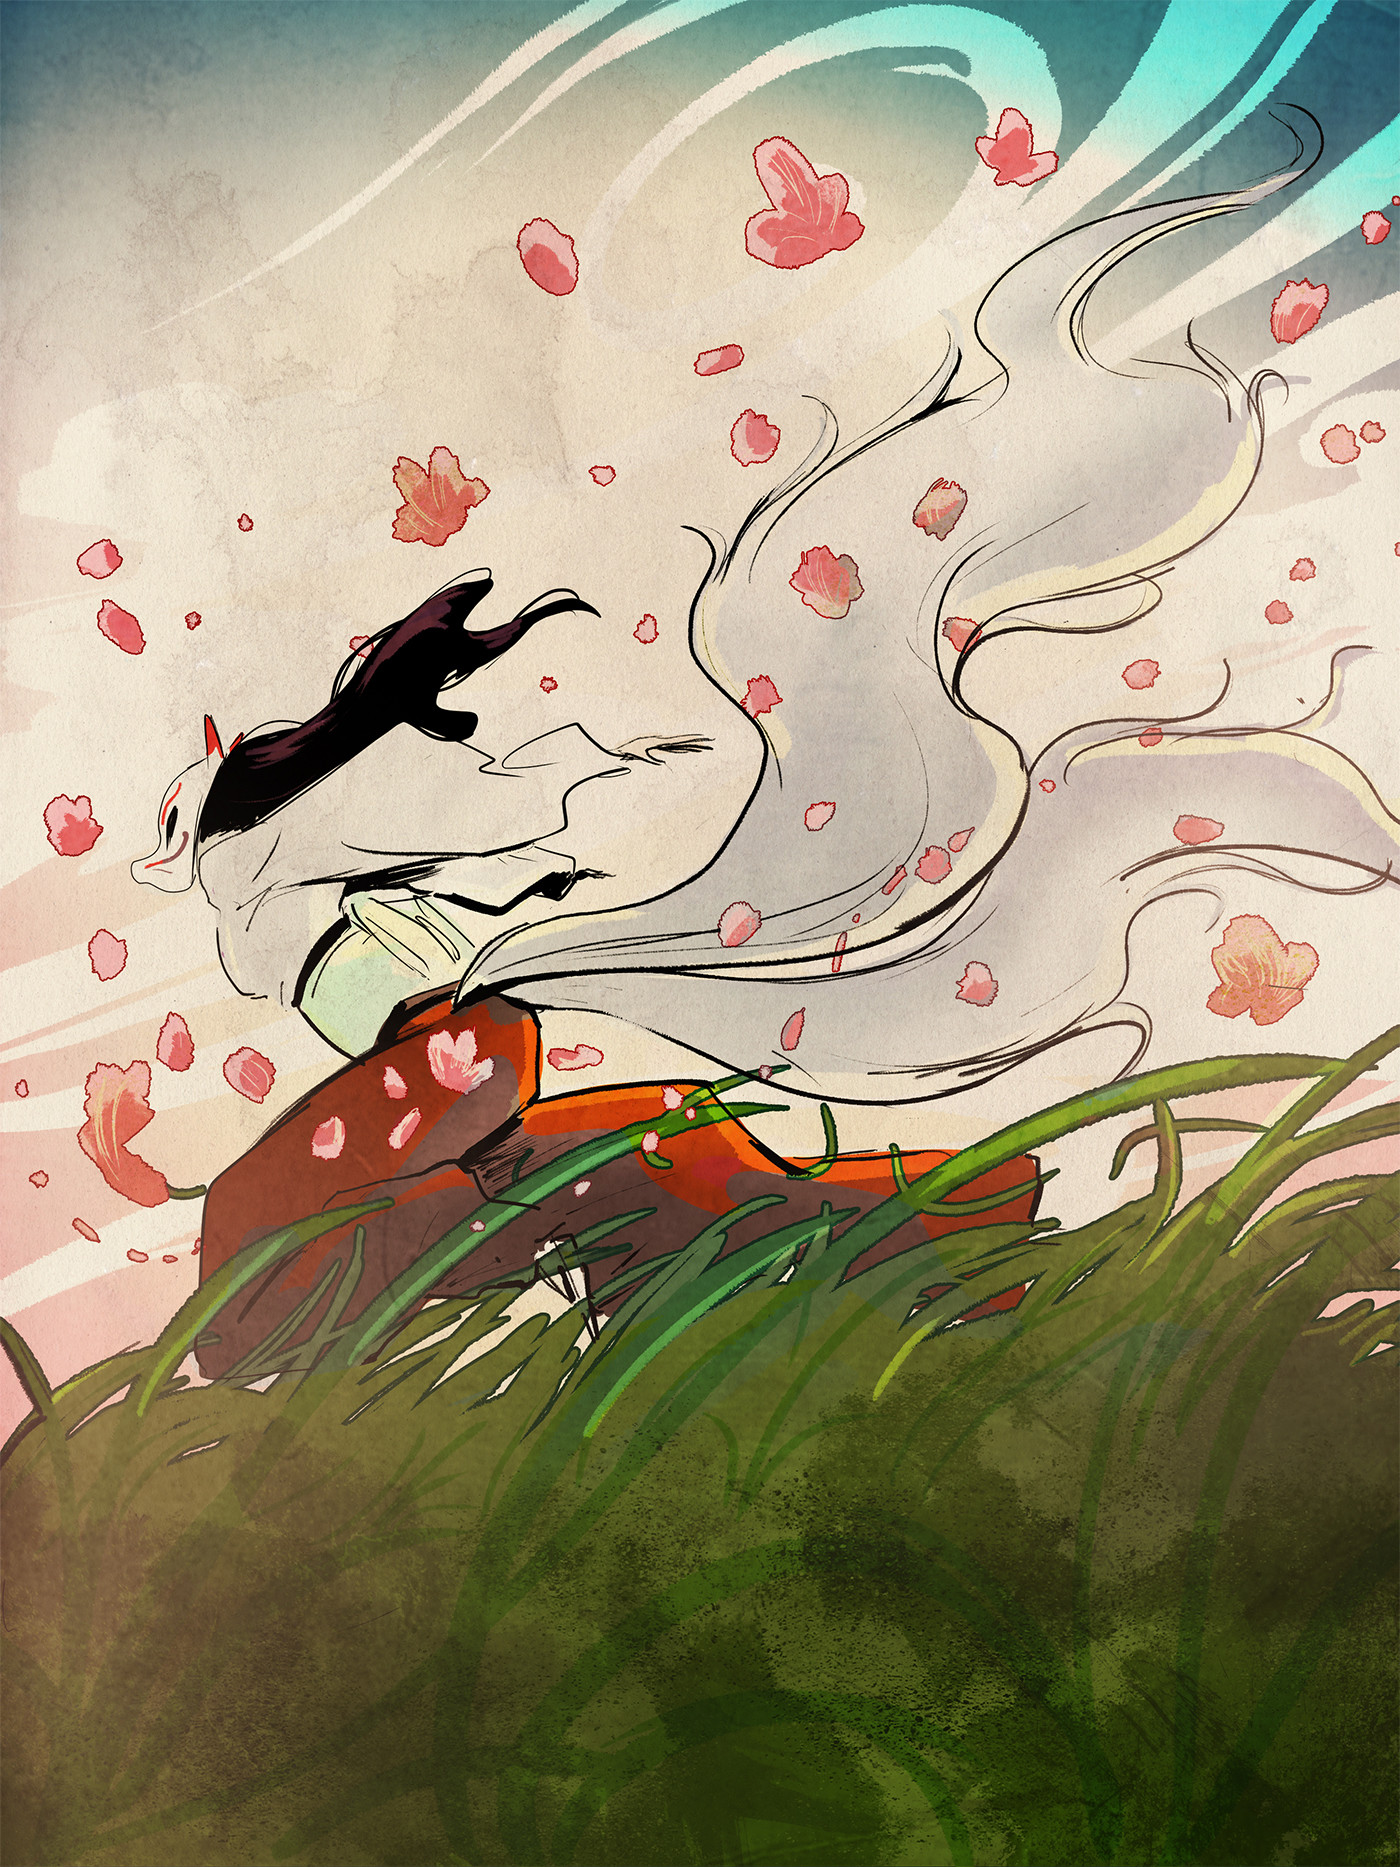 Lamaro smith jinja kitsune forest 0001 jinja kitsune wind